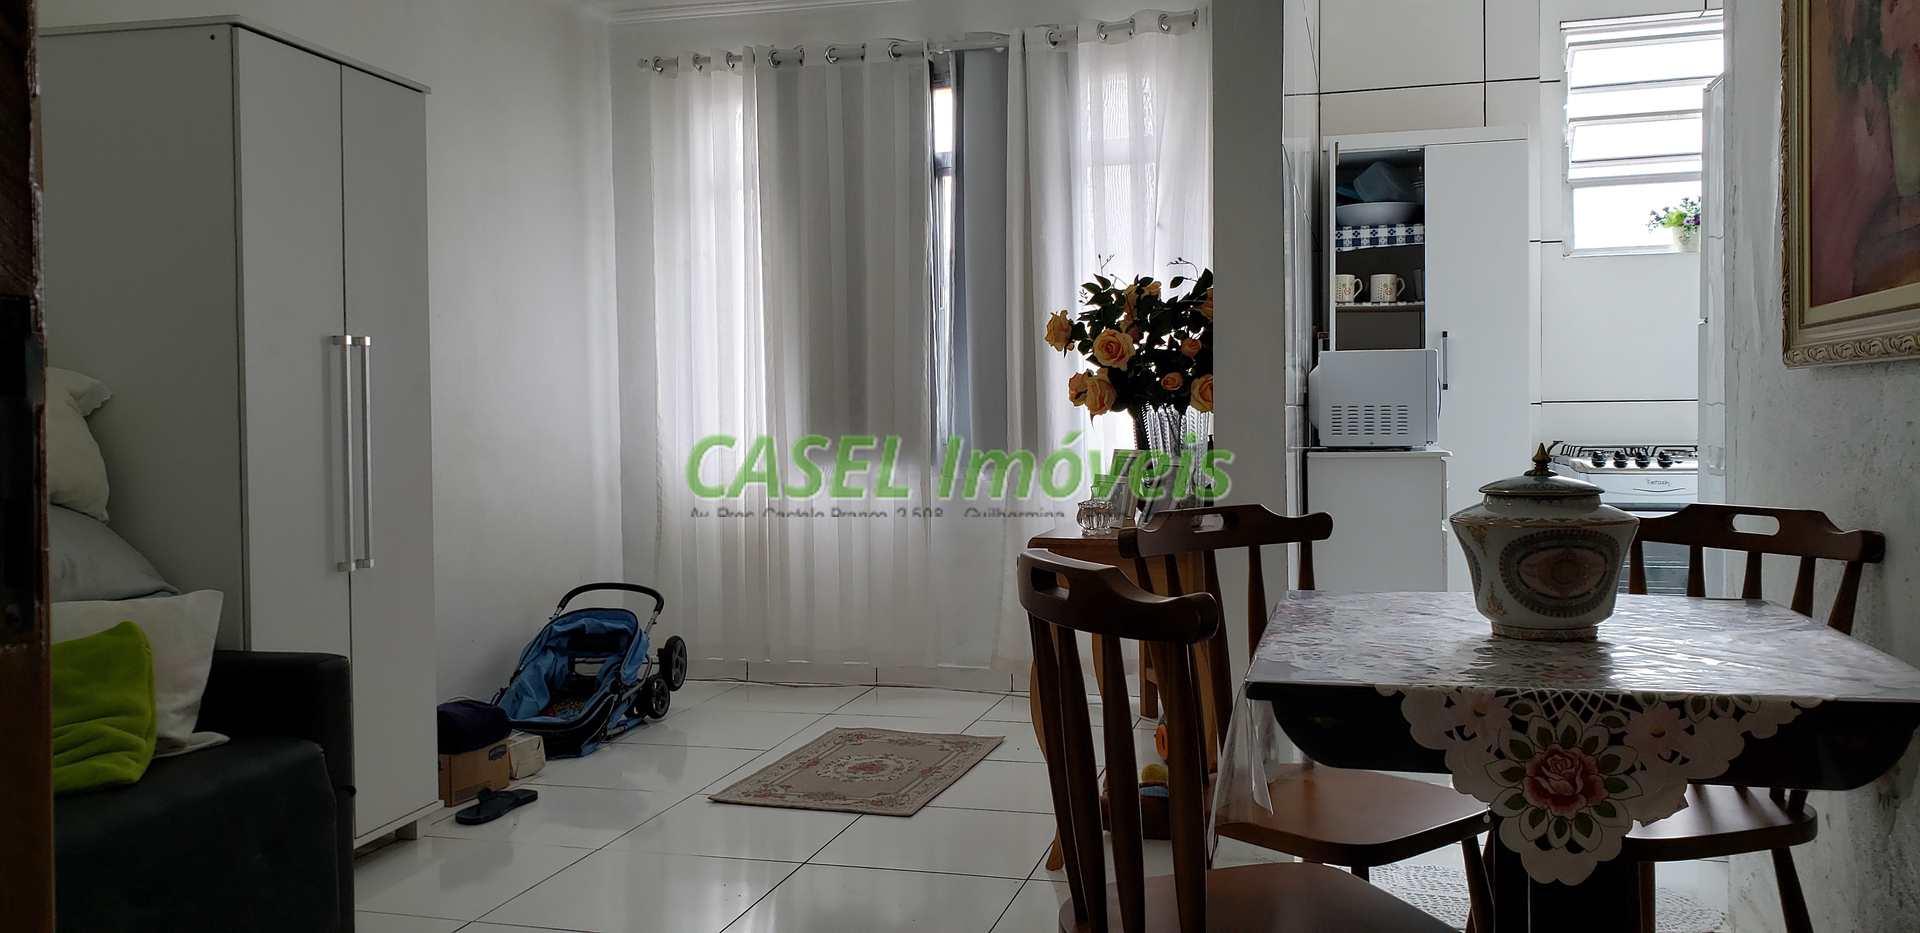 Kitnet, Canto do Forte, Praia Grande - R$ 125 mil, Cod: 804106